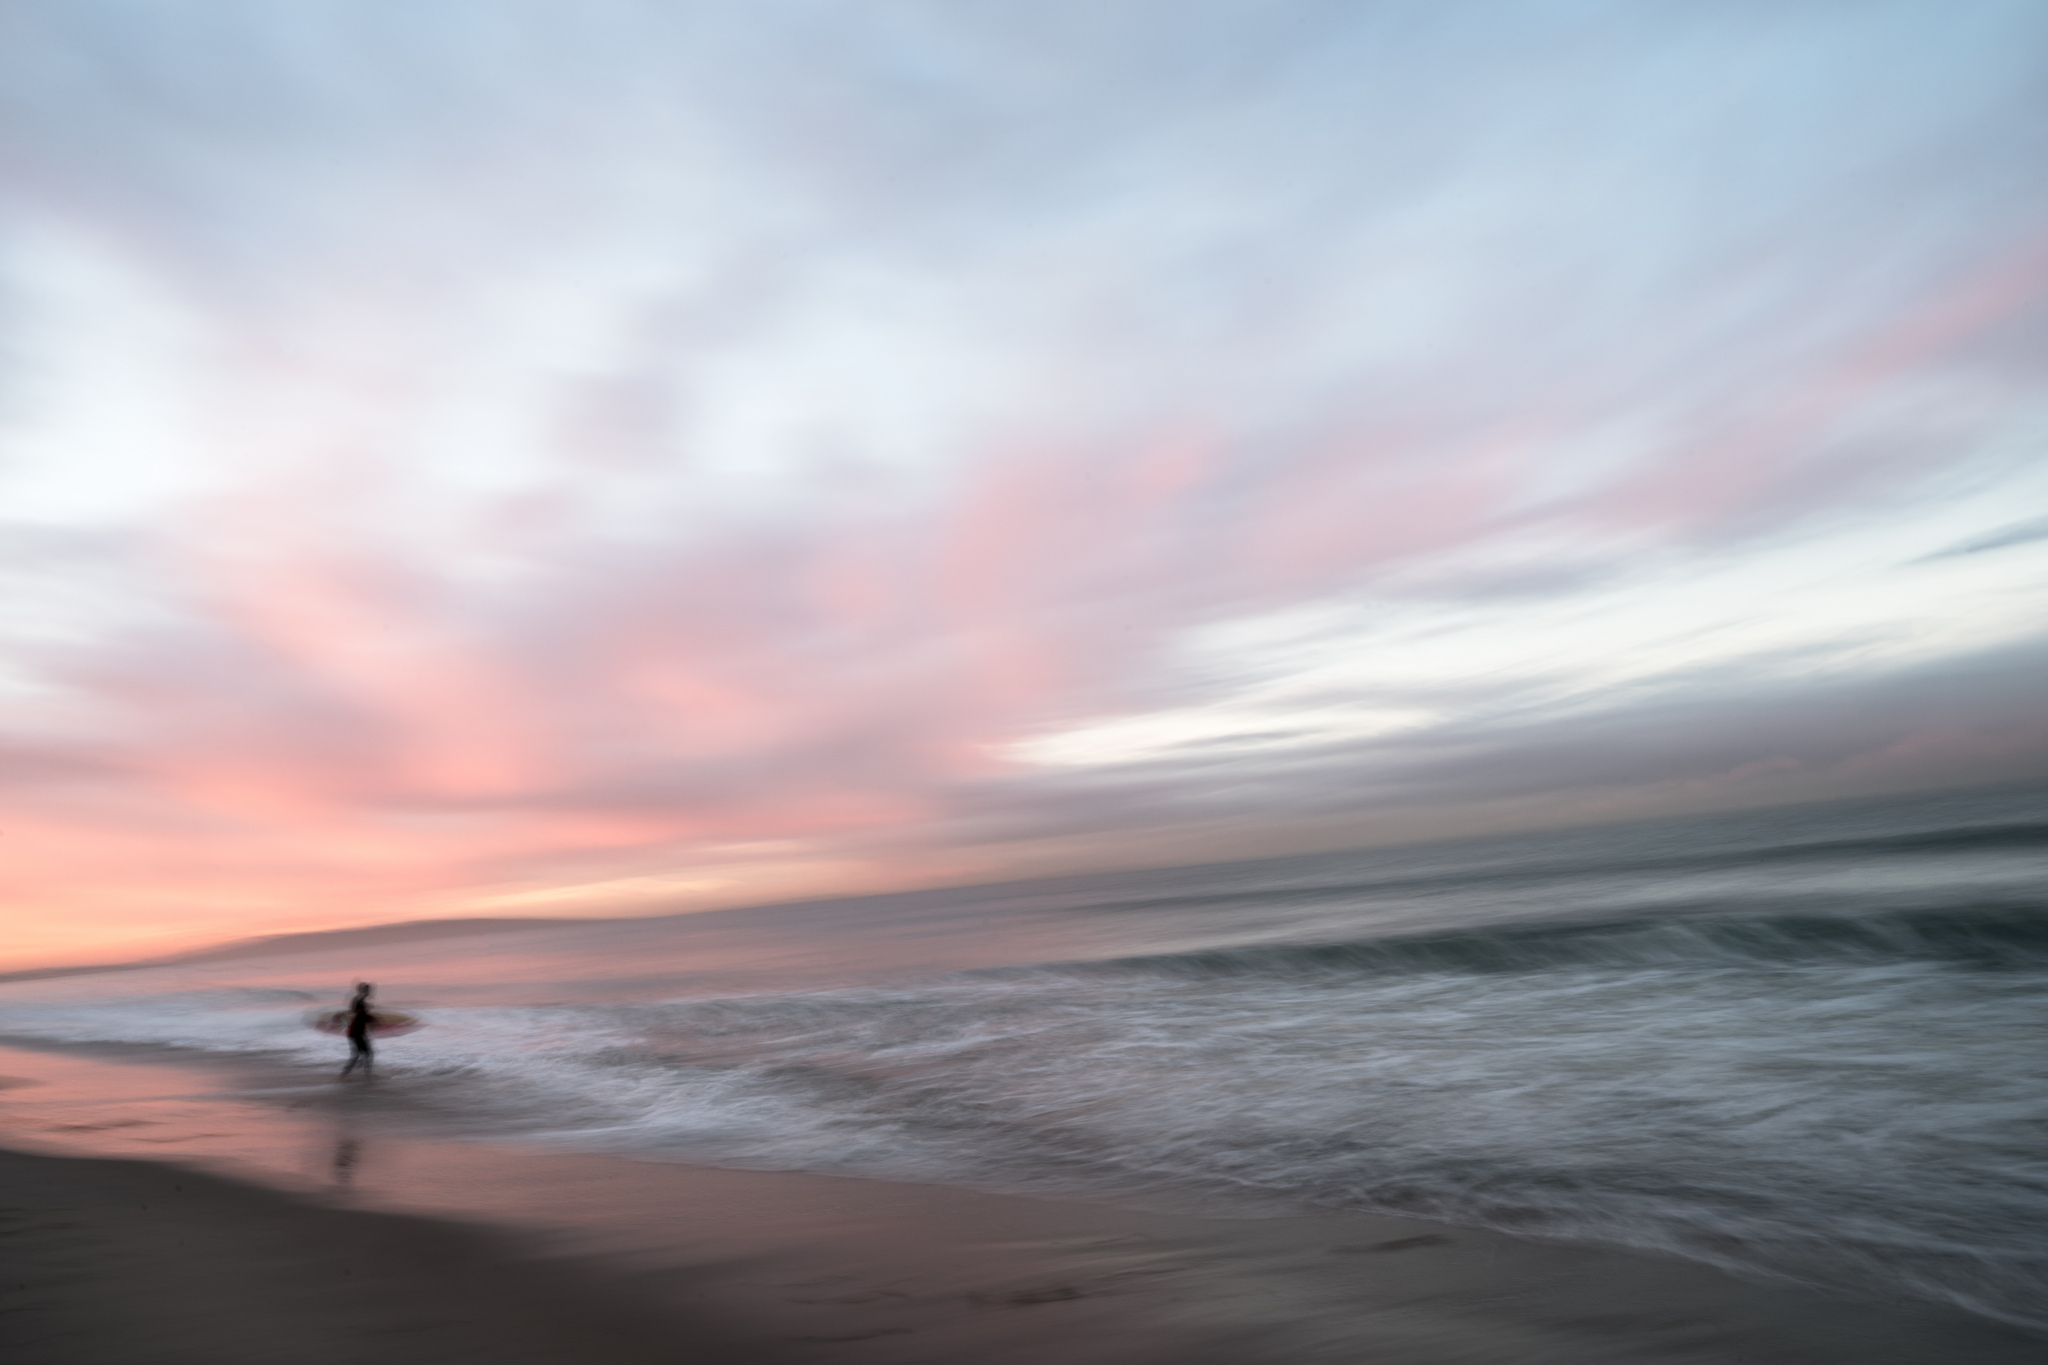 Sunrise surfer, Santa Monica California